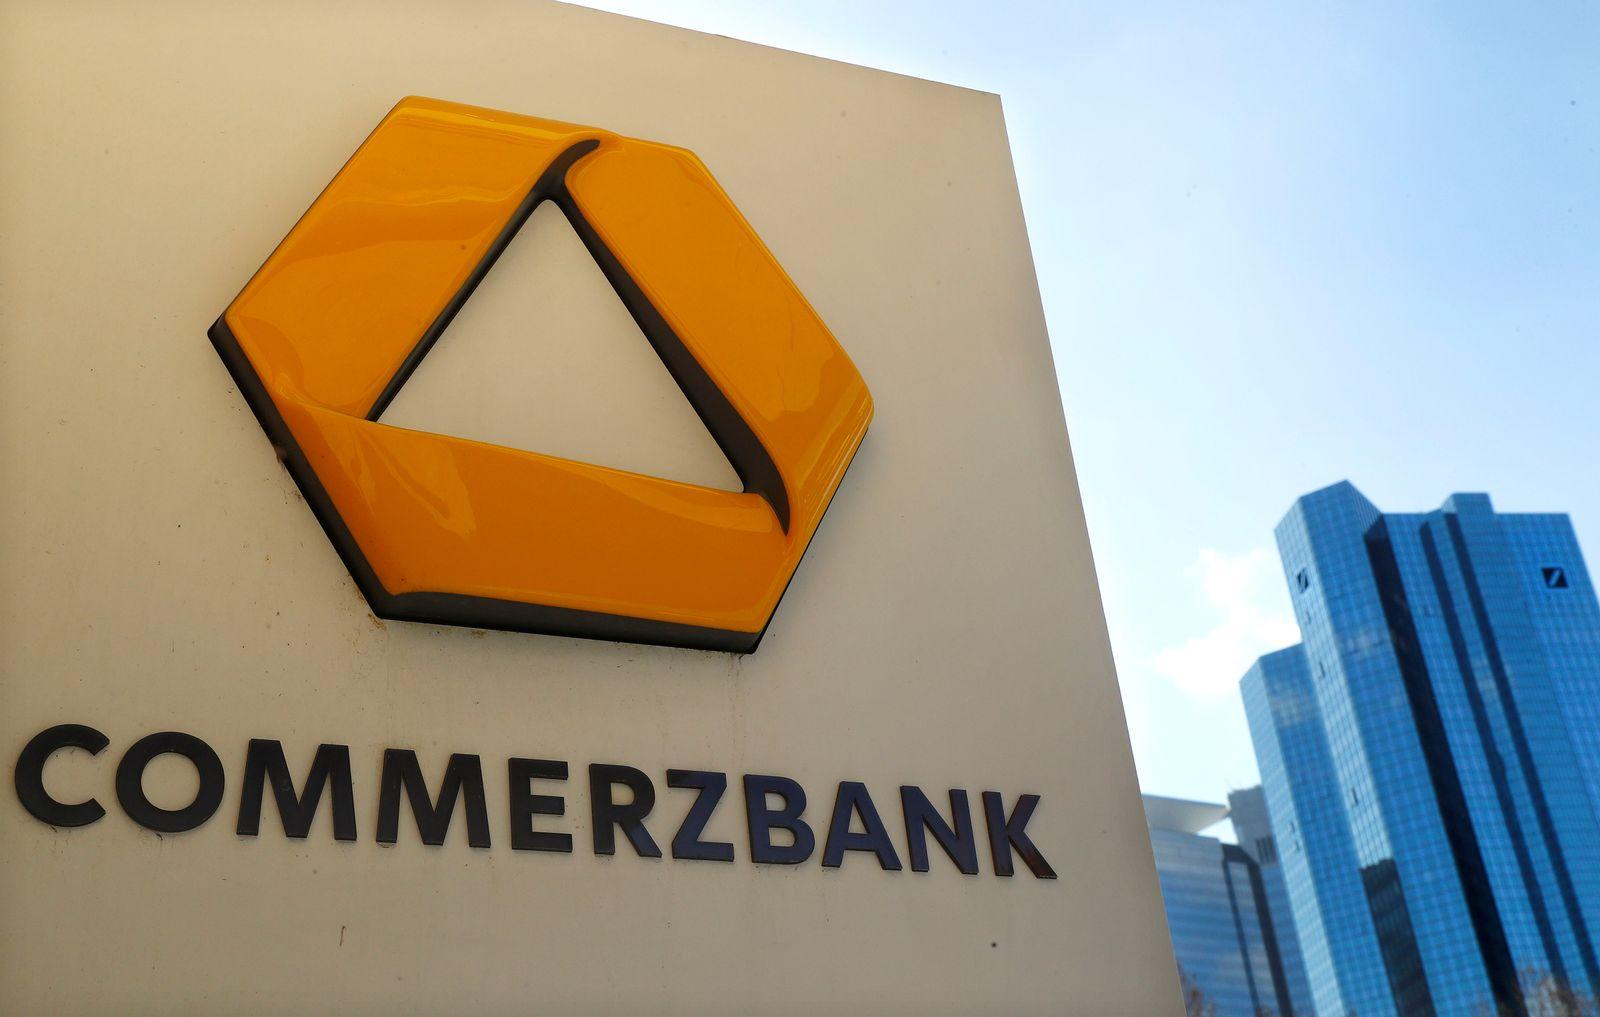 COMMERZBANK-M&A/DEUTSCHE BANK